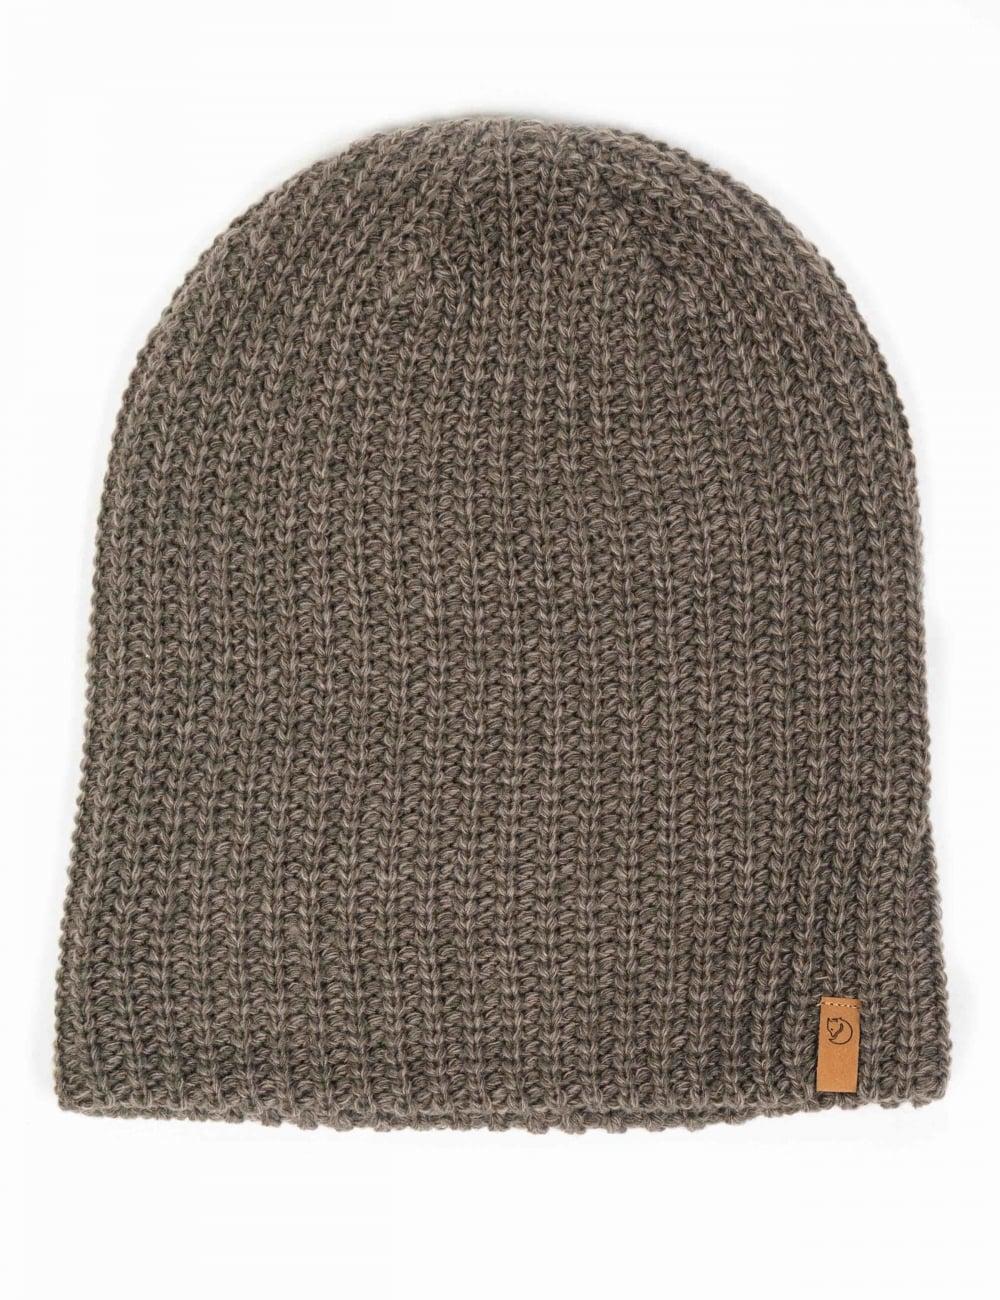 3eba04fa2e4814 Fjallraven Ovik Melange Beanie Hat - Mountain Grey - Accessories ...